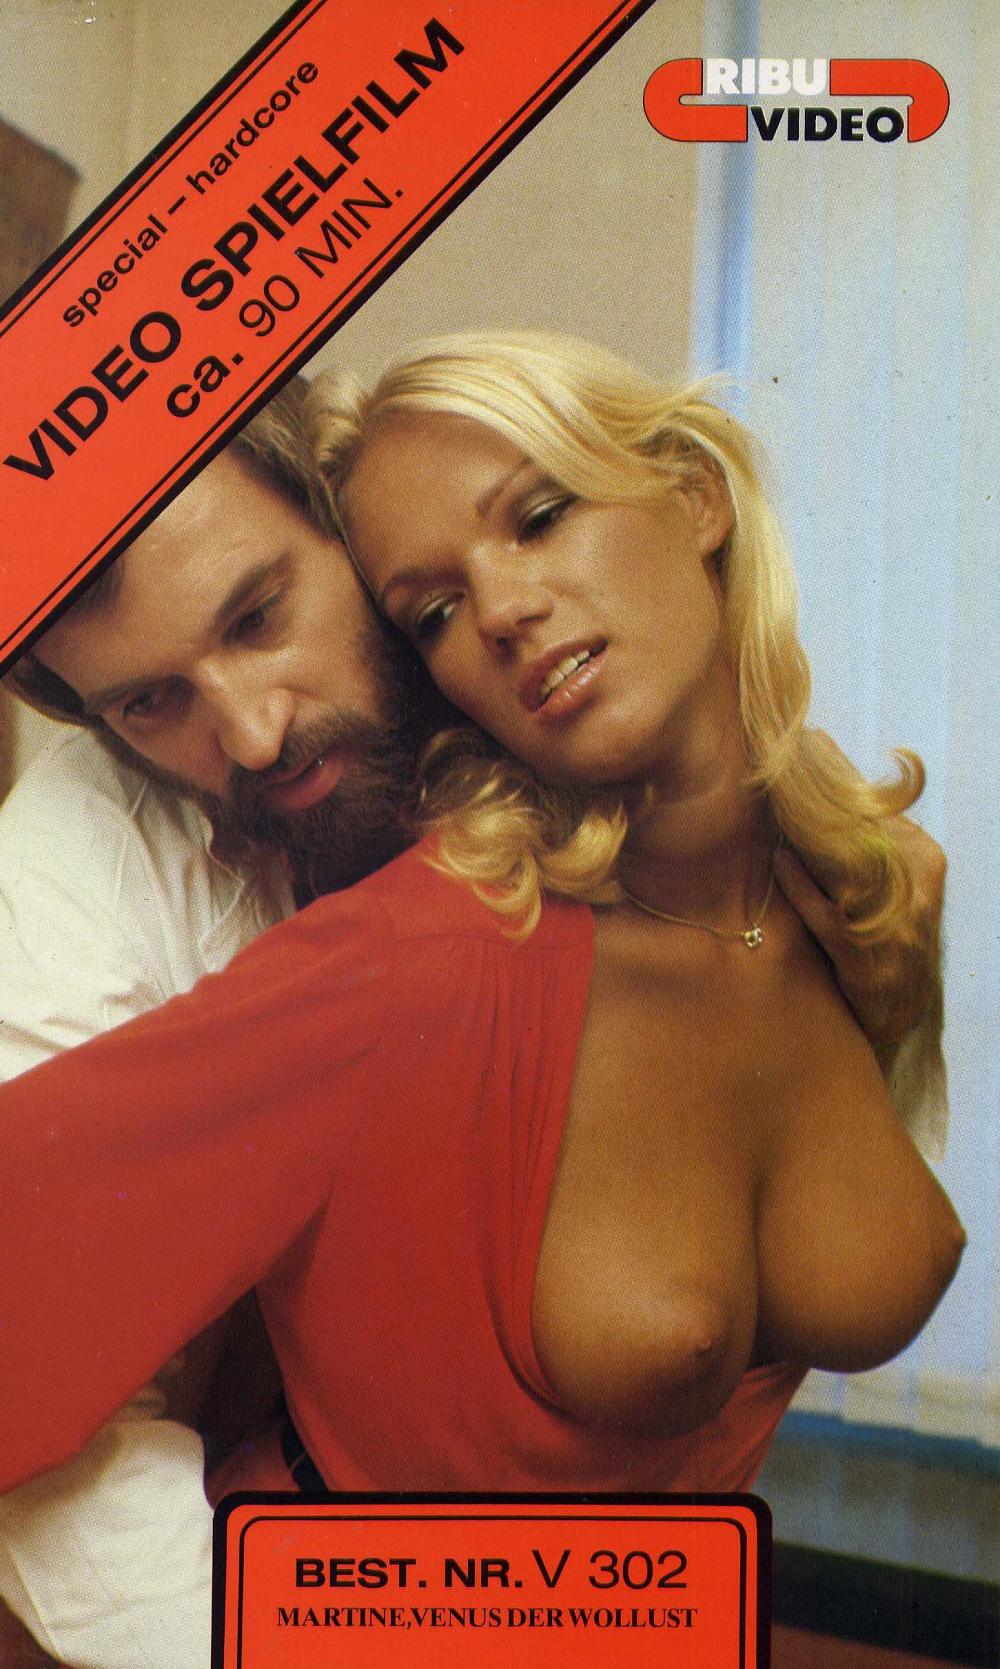 1979 Porn Movies ribu video 302 - martine venus der wollust (1979) » vintage